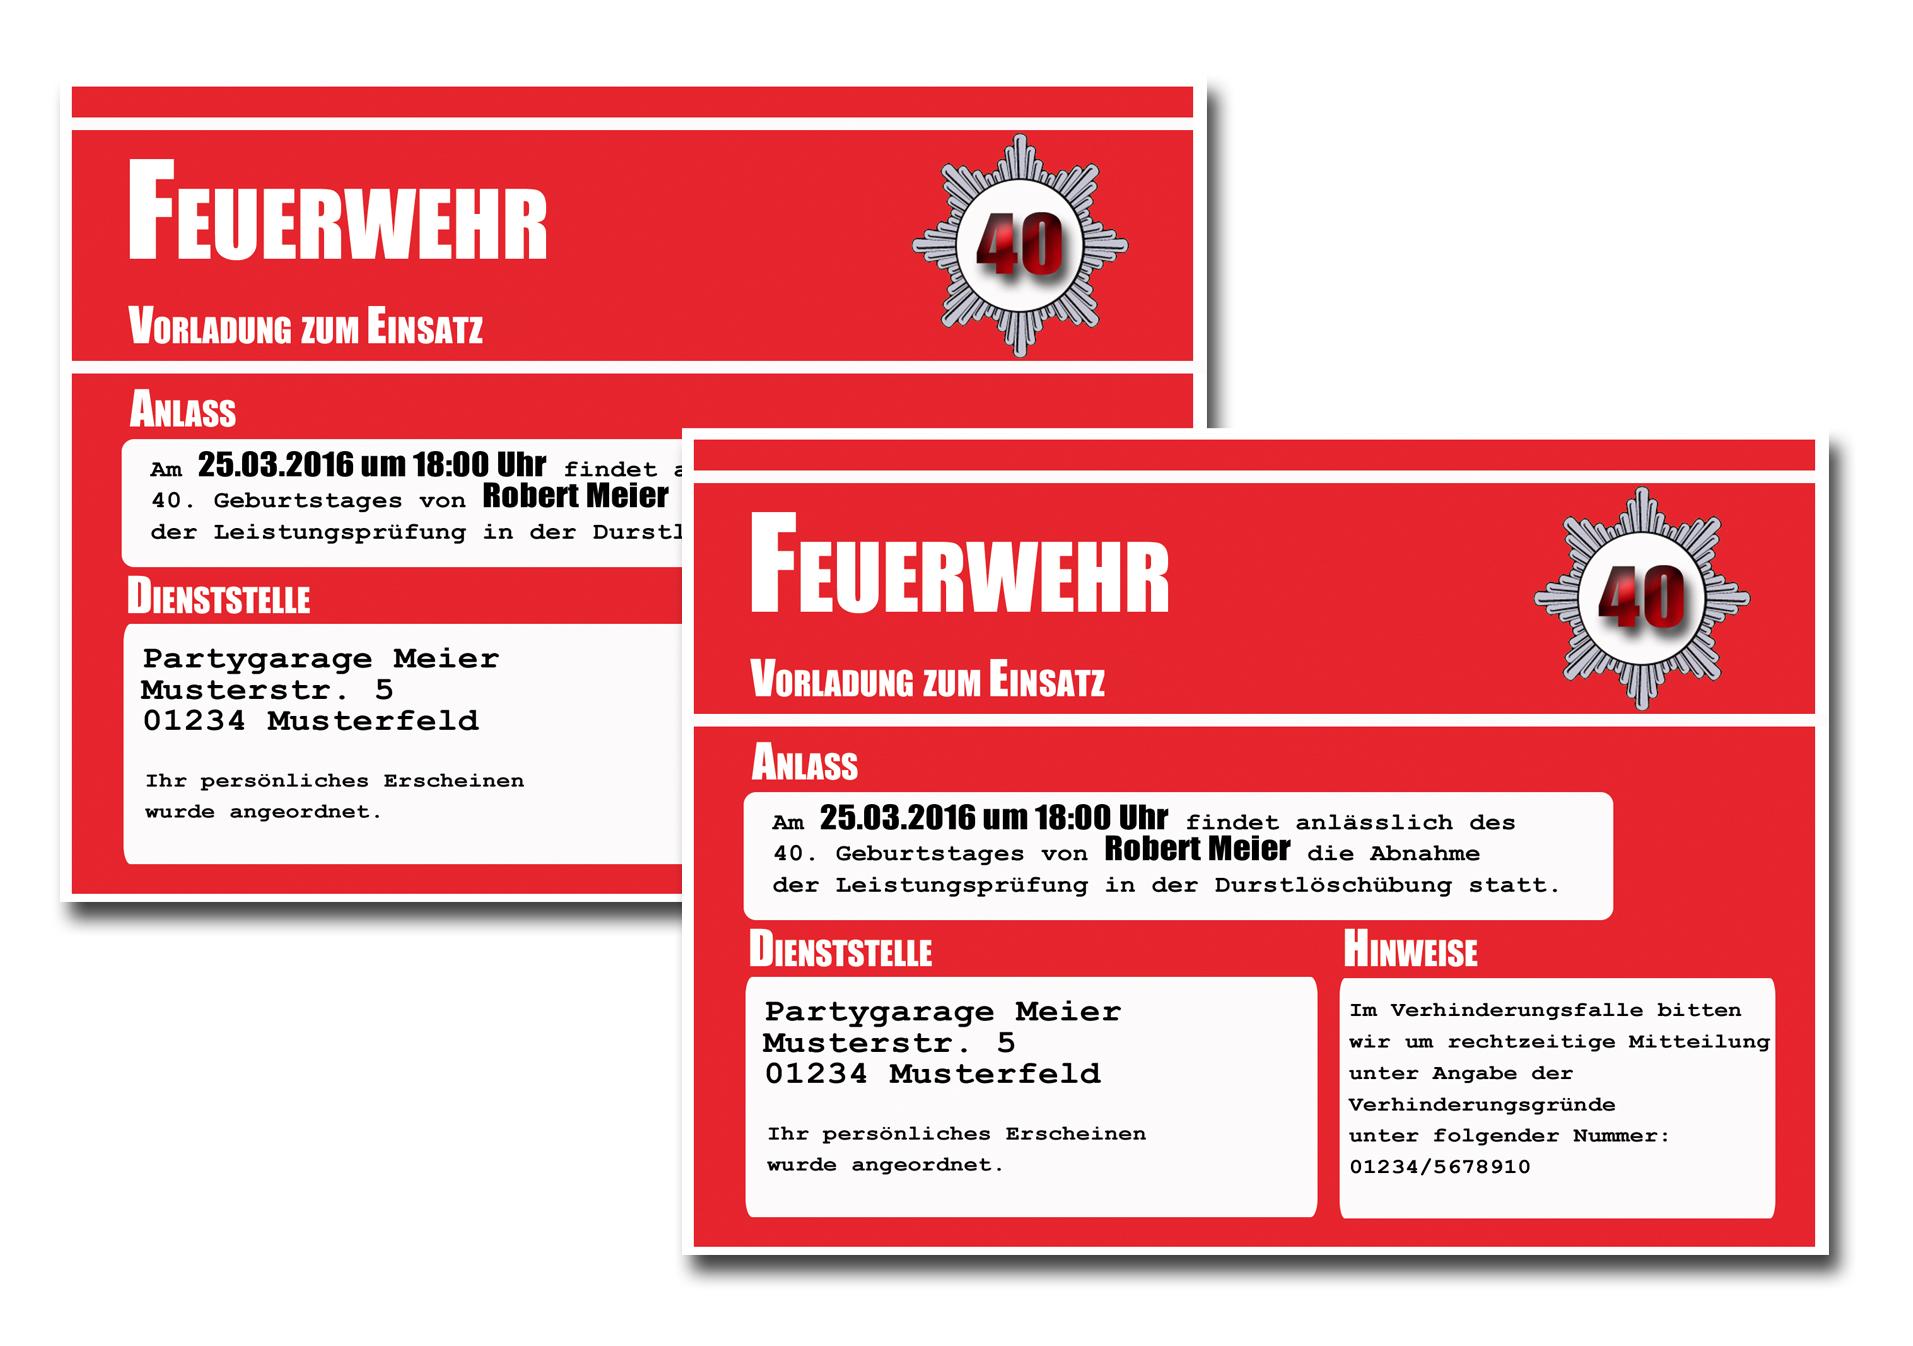 Tatort Einladungskarte U2013 Cloudhash, Einladungs